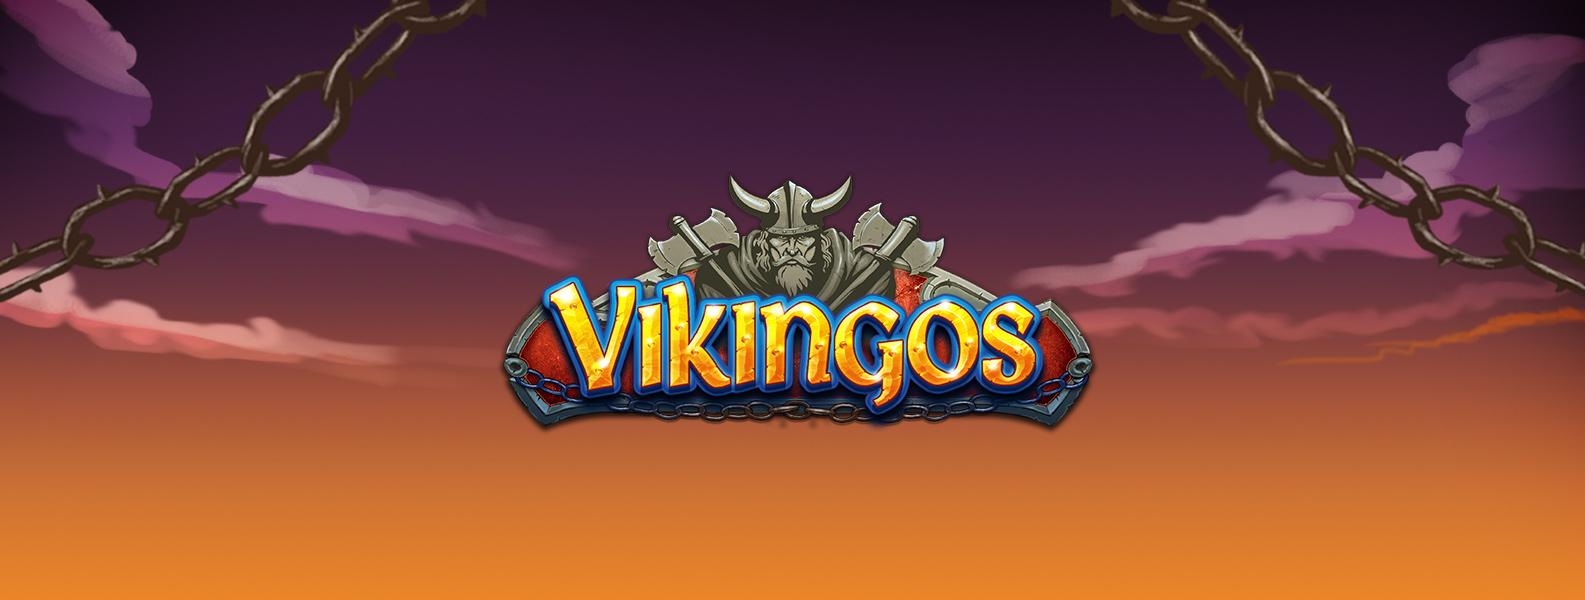 cabecera_Vikingos